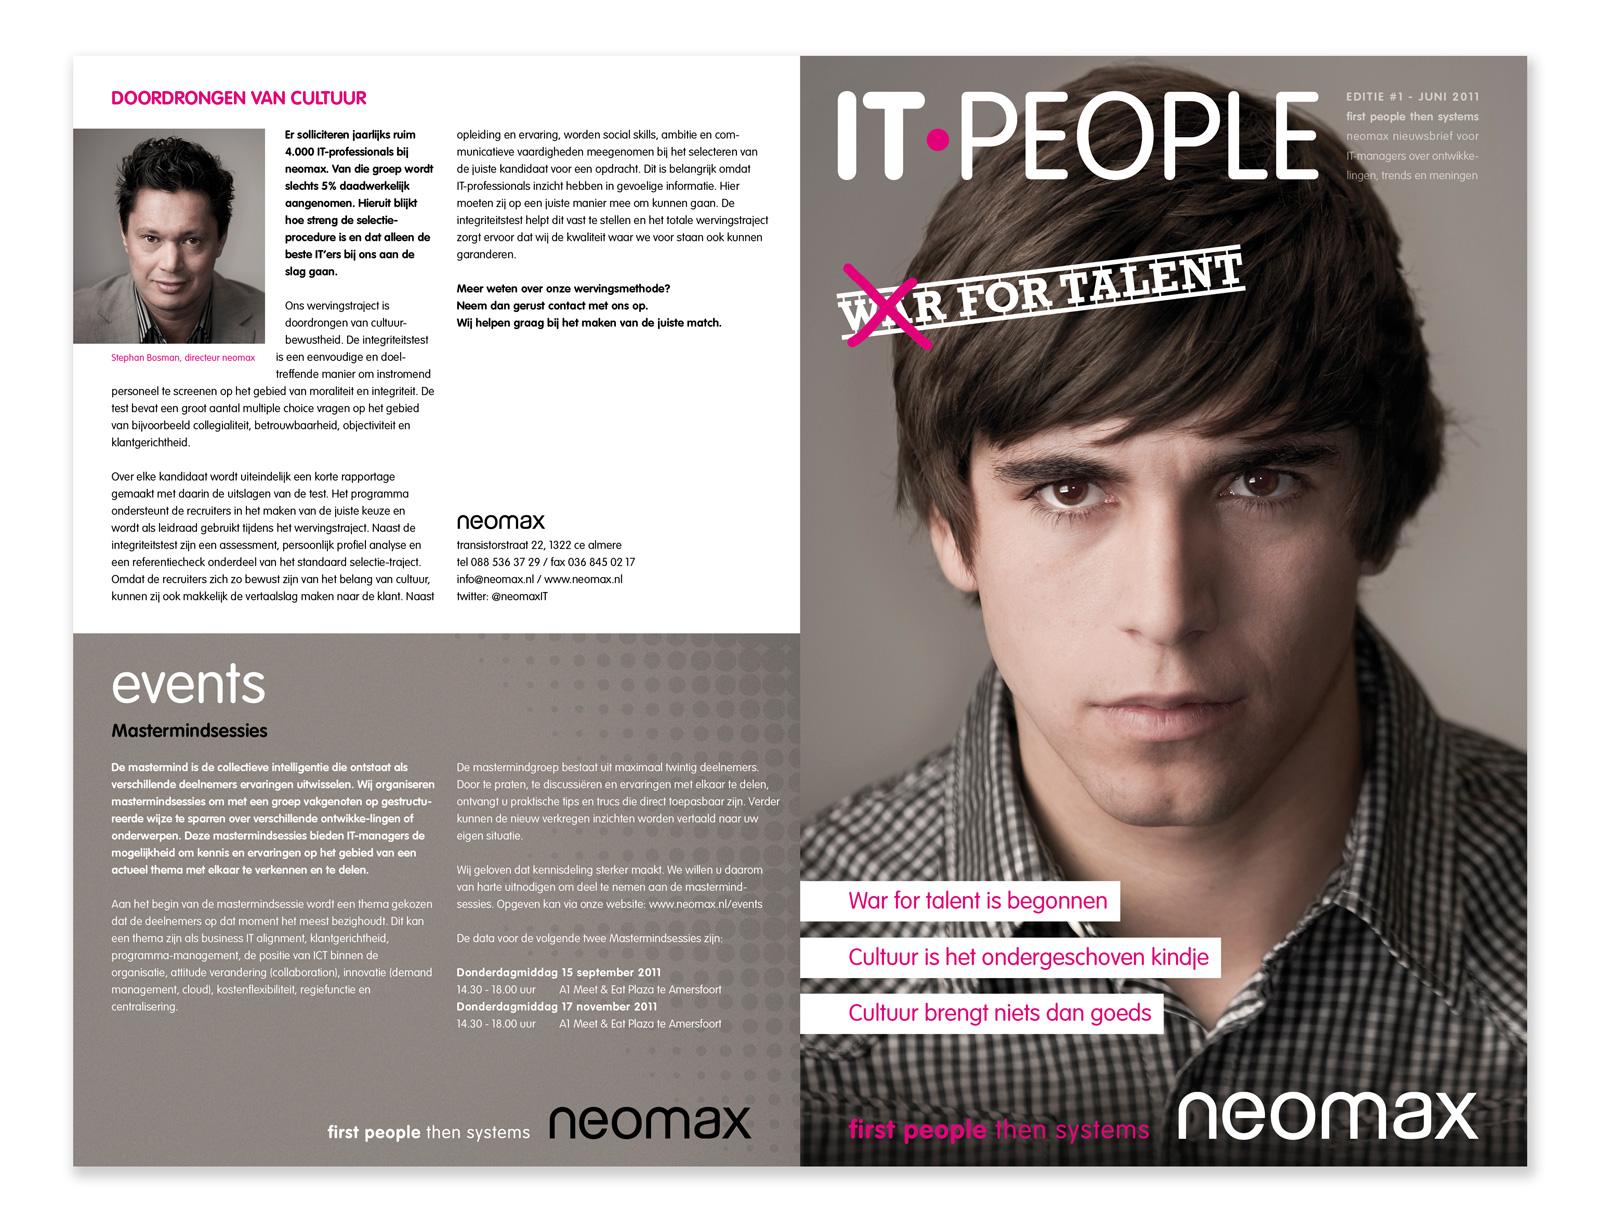 Nieuwsbrief-Neomax_1